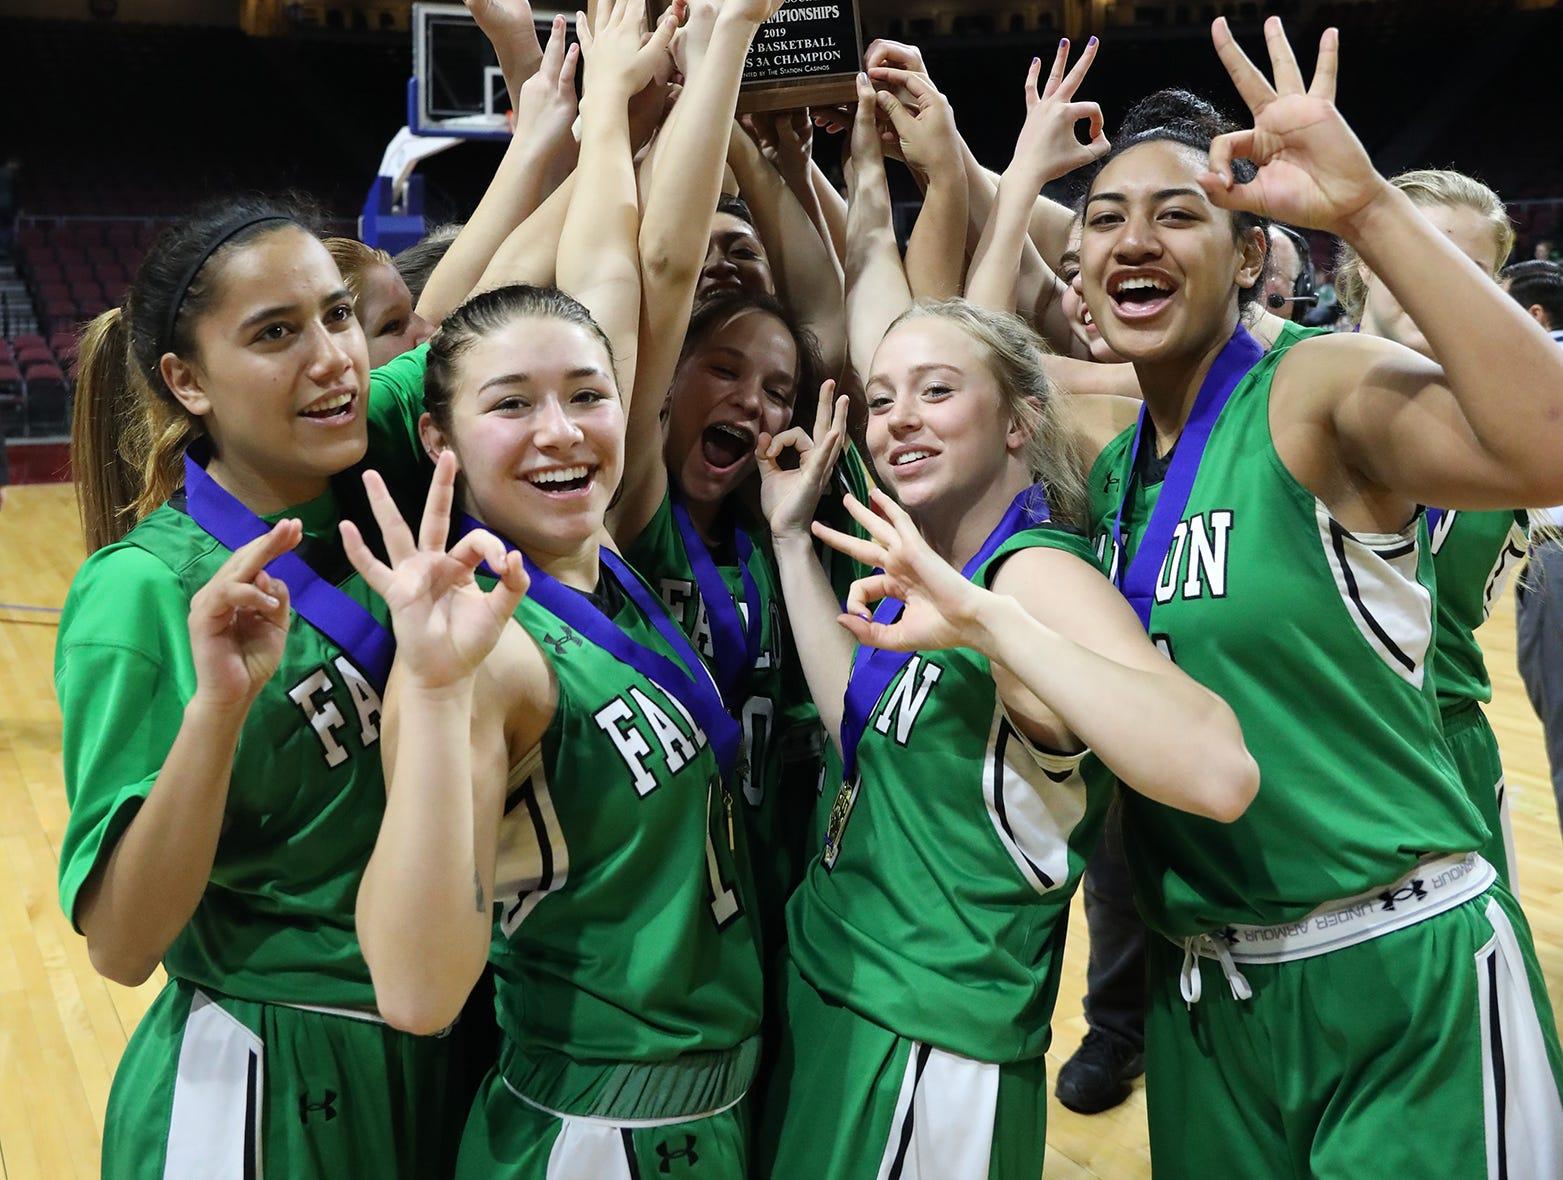 The Fallon girls basketball team won its third straight state championship on Saturday.